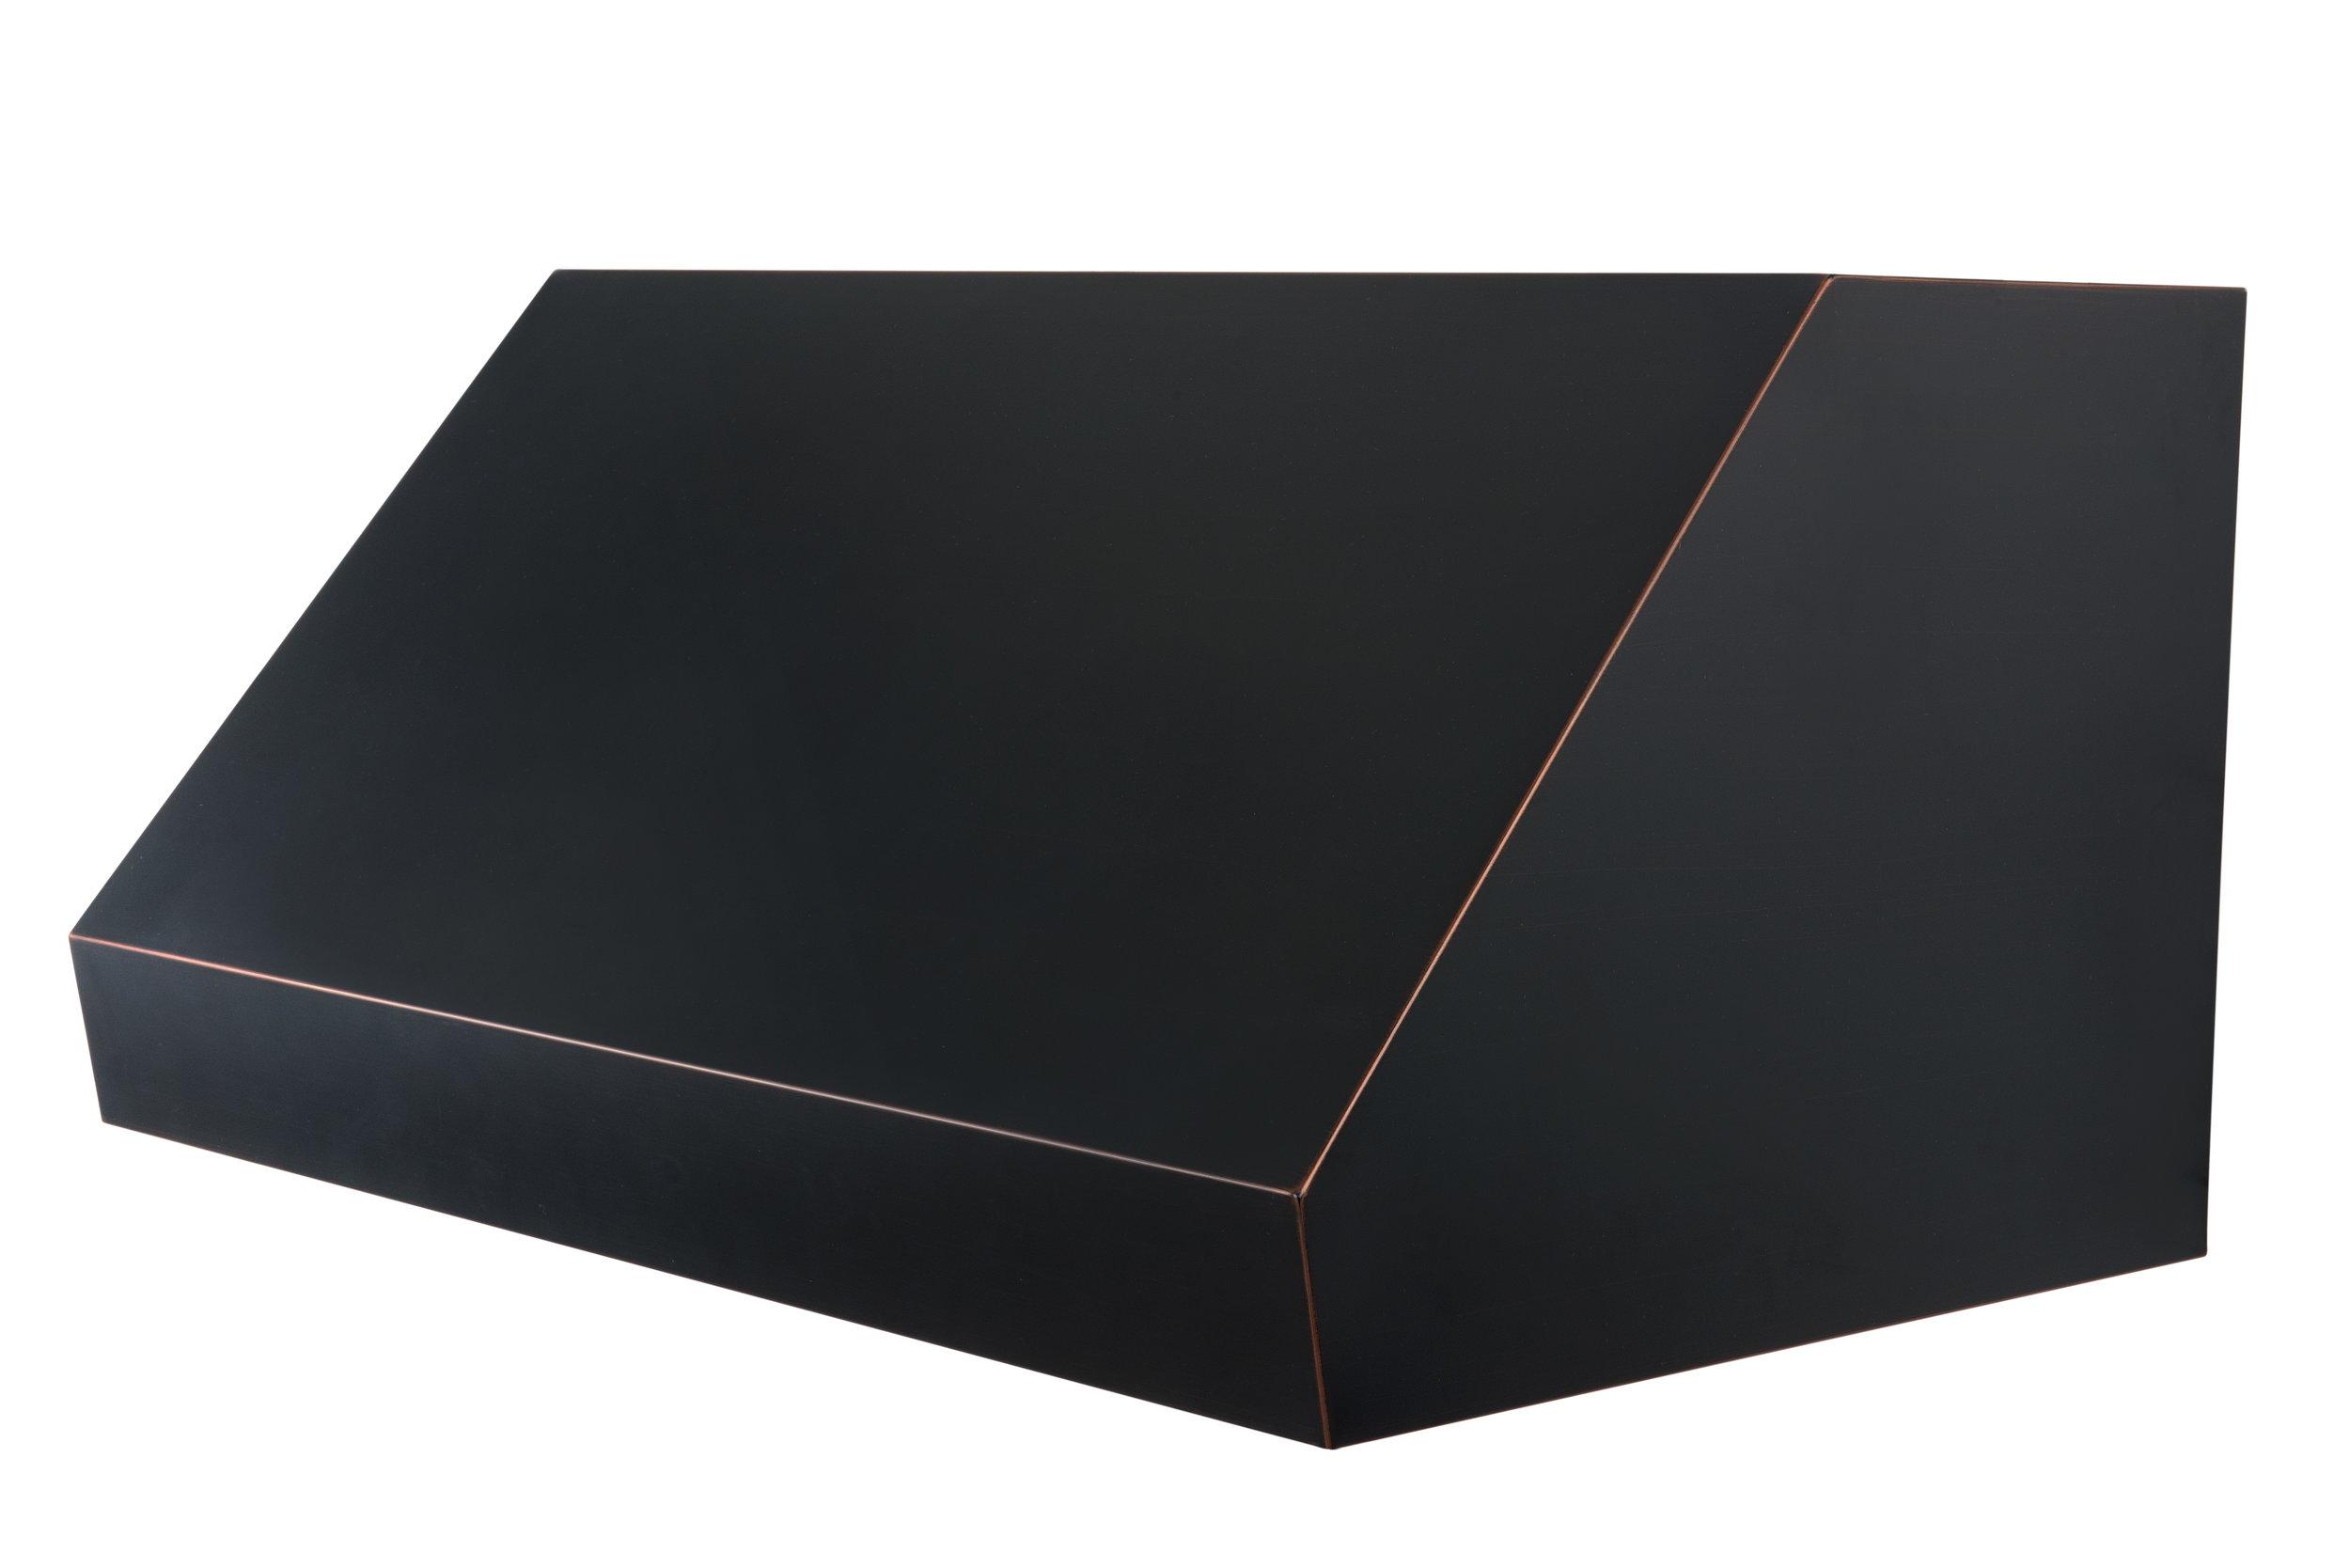 zline-black-under-cabinet-range-hood-8685B-main.jpg